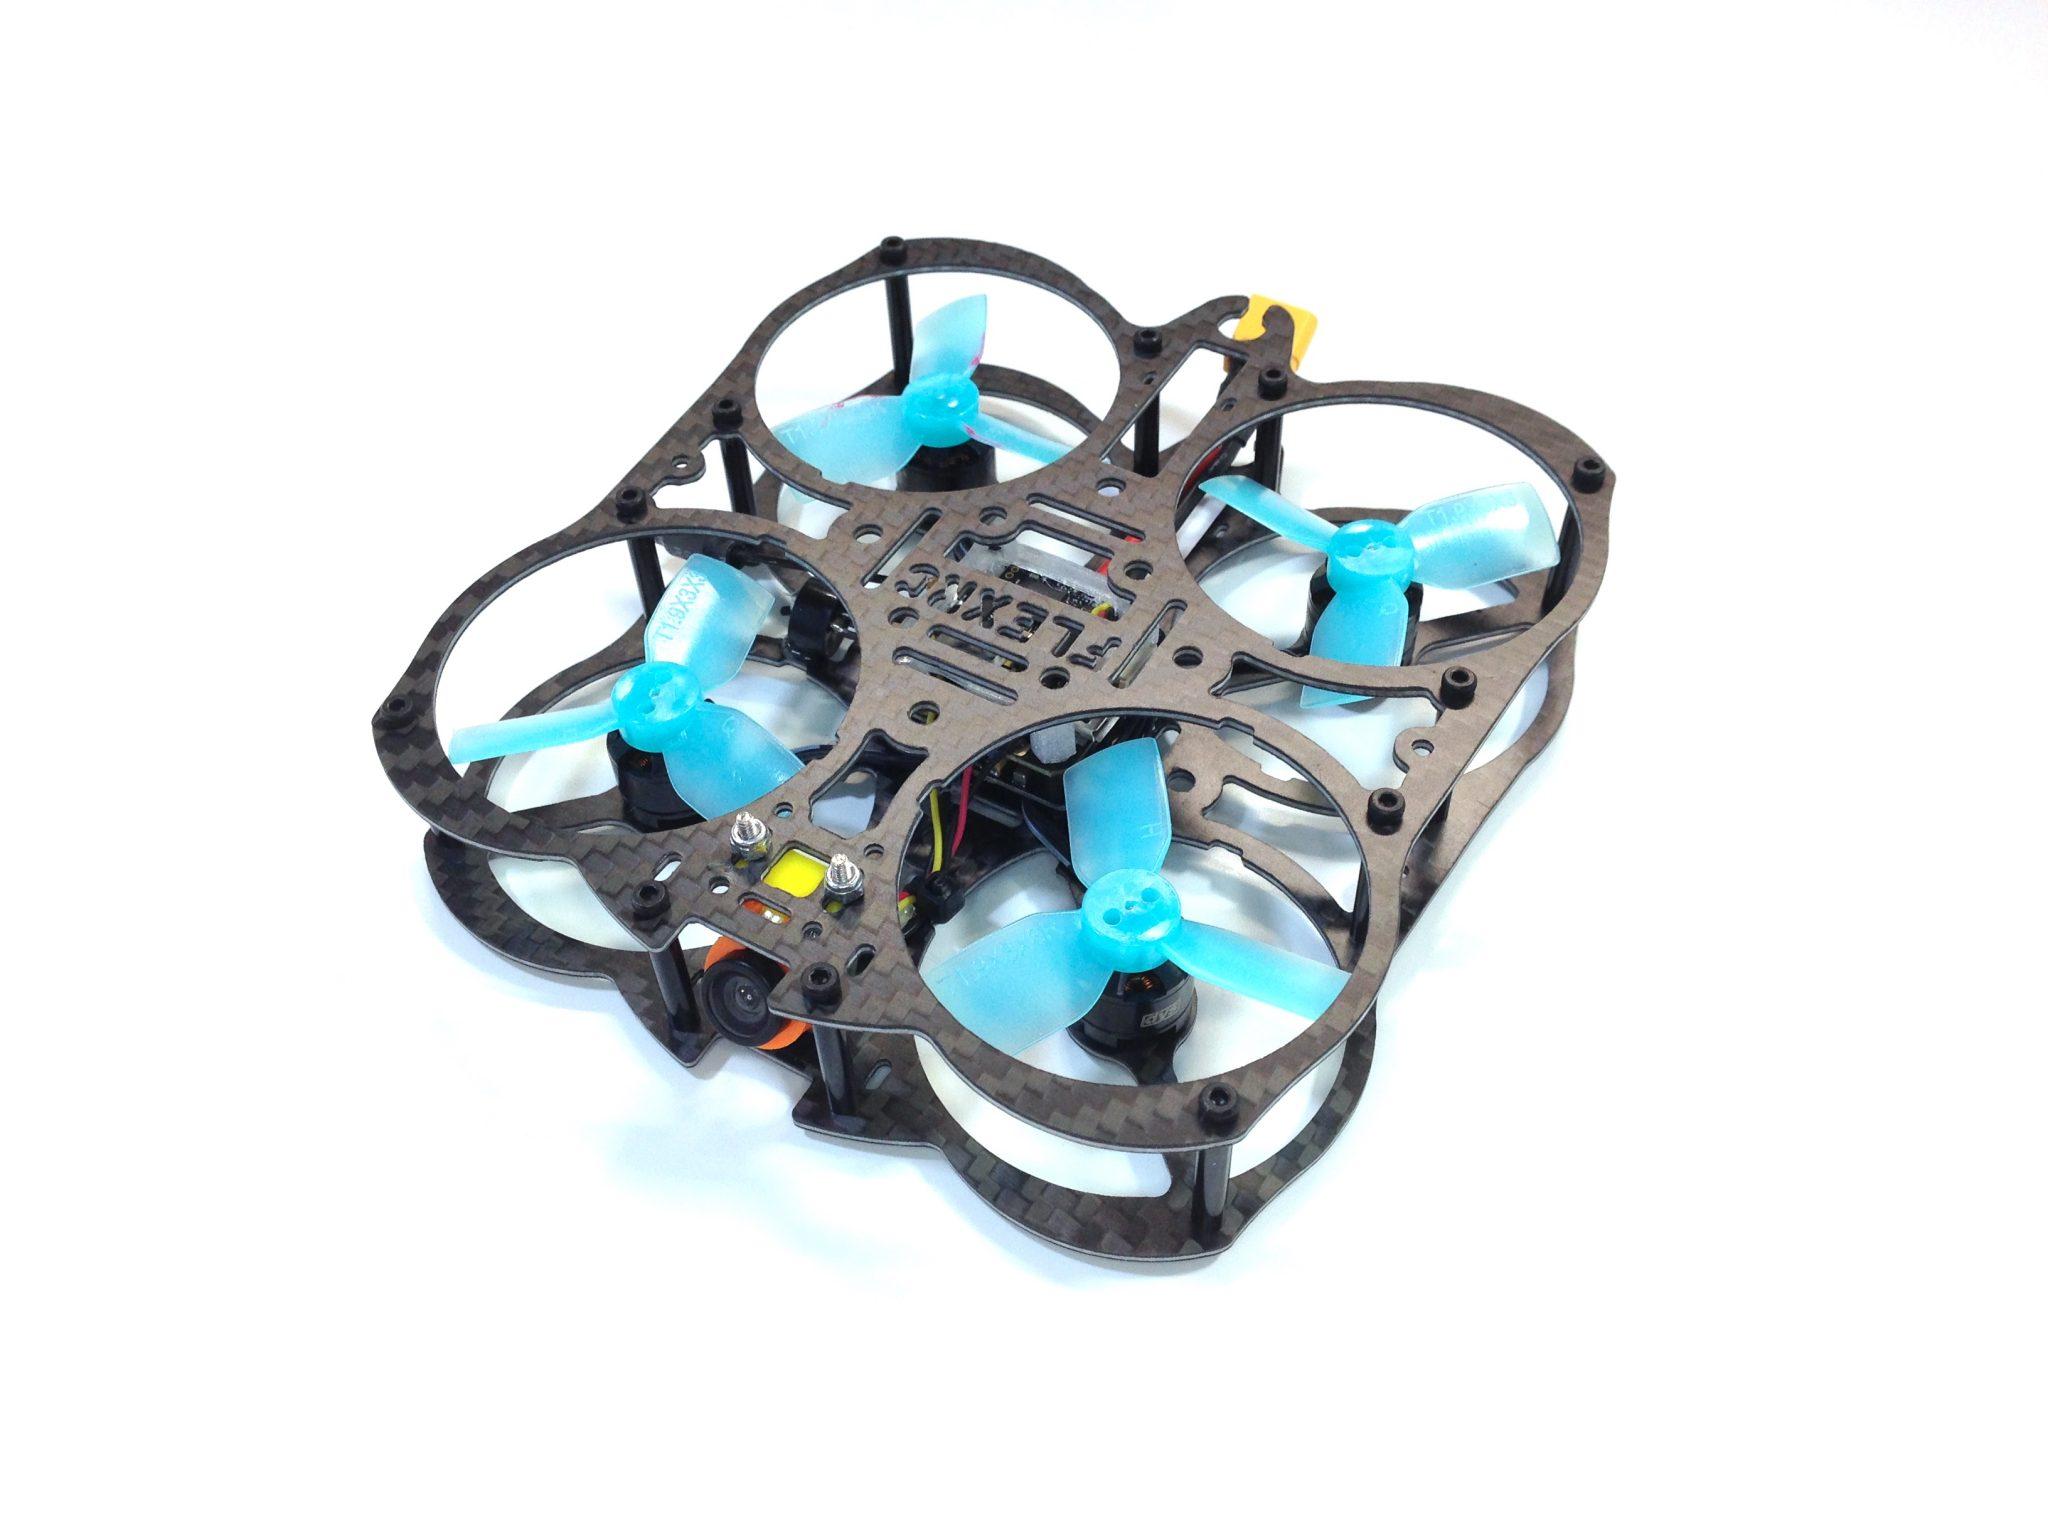 Mini Owl - Extreme - FPV Proximity Racing Drone - DIY Kit